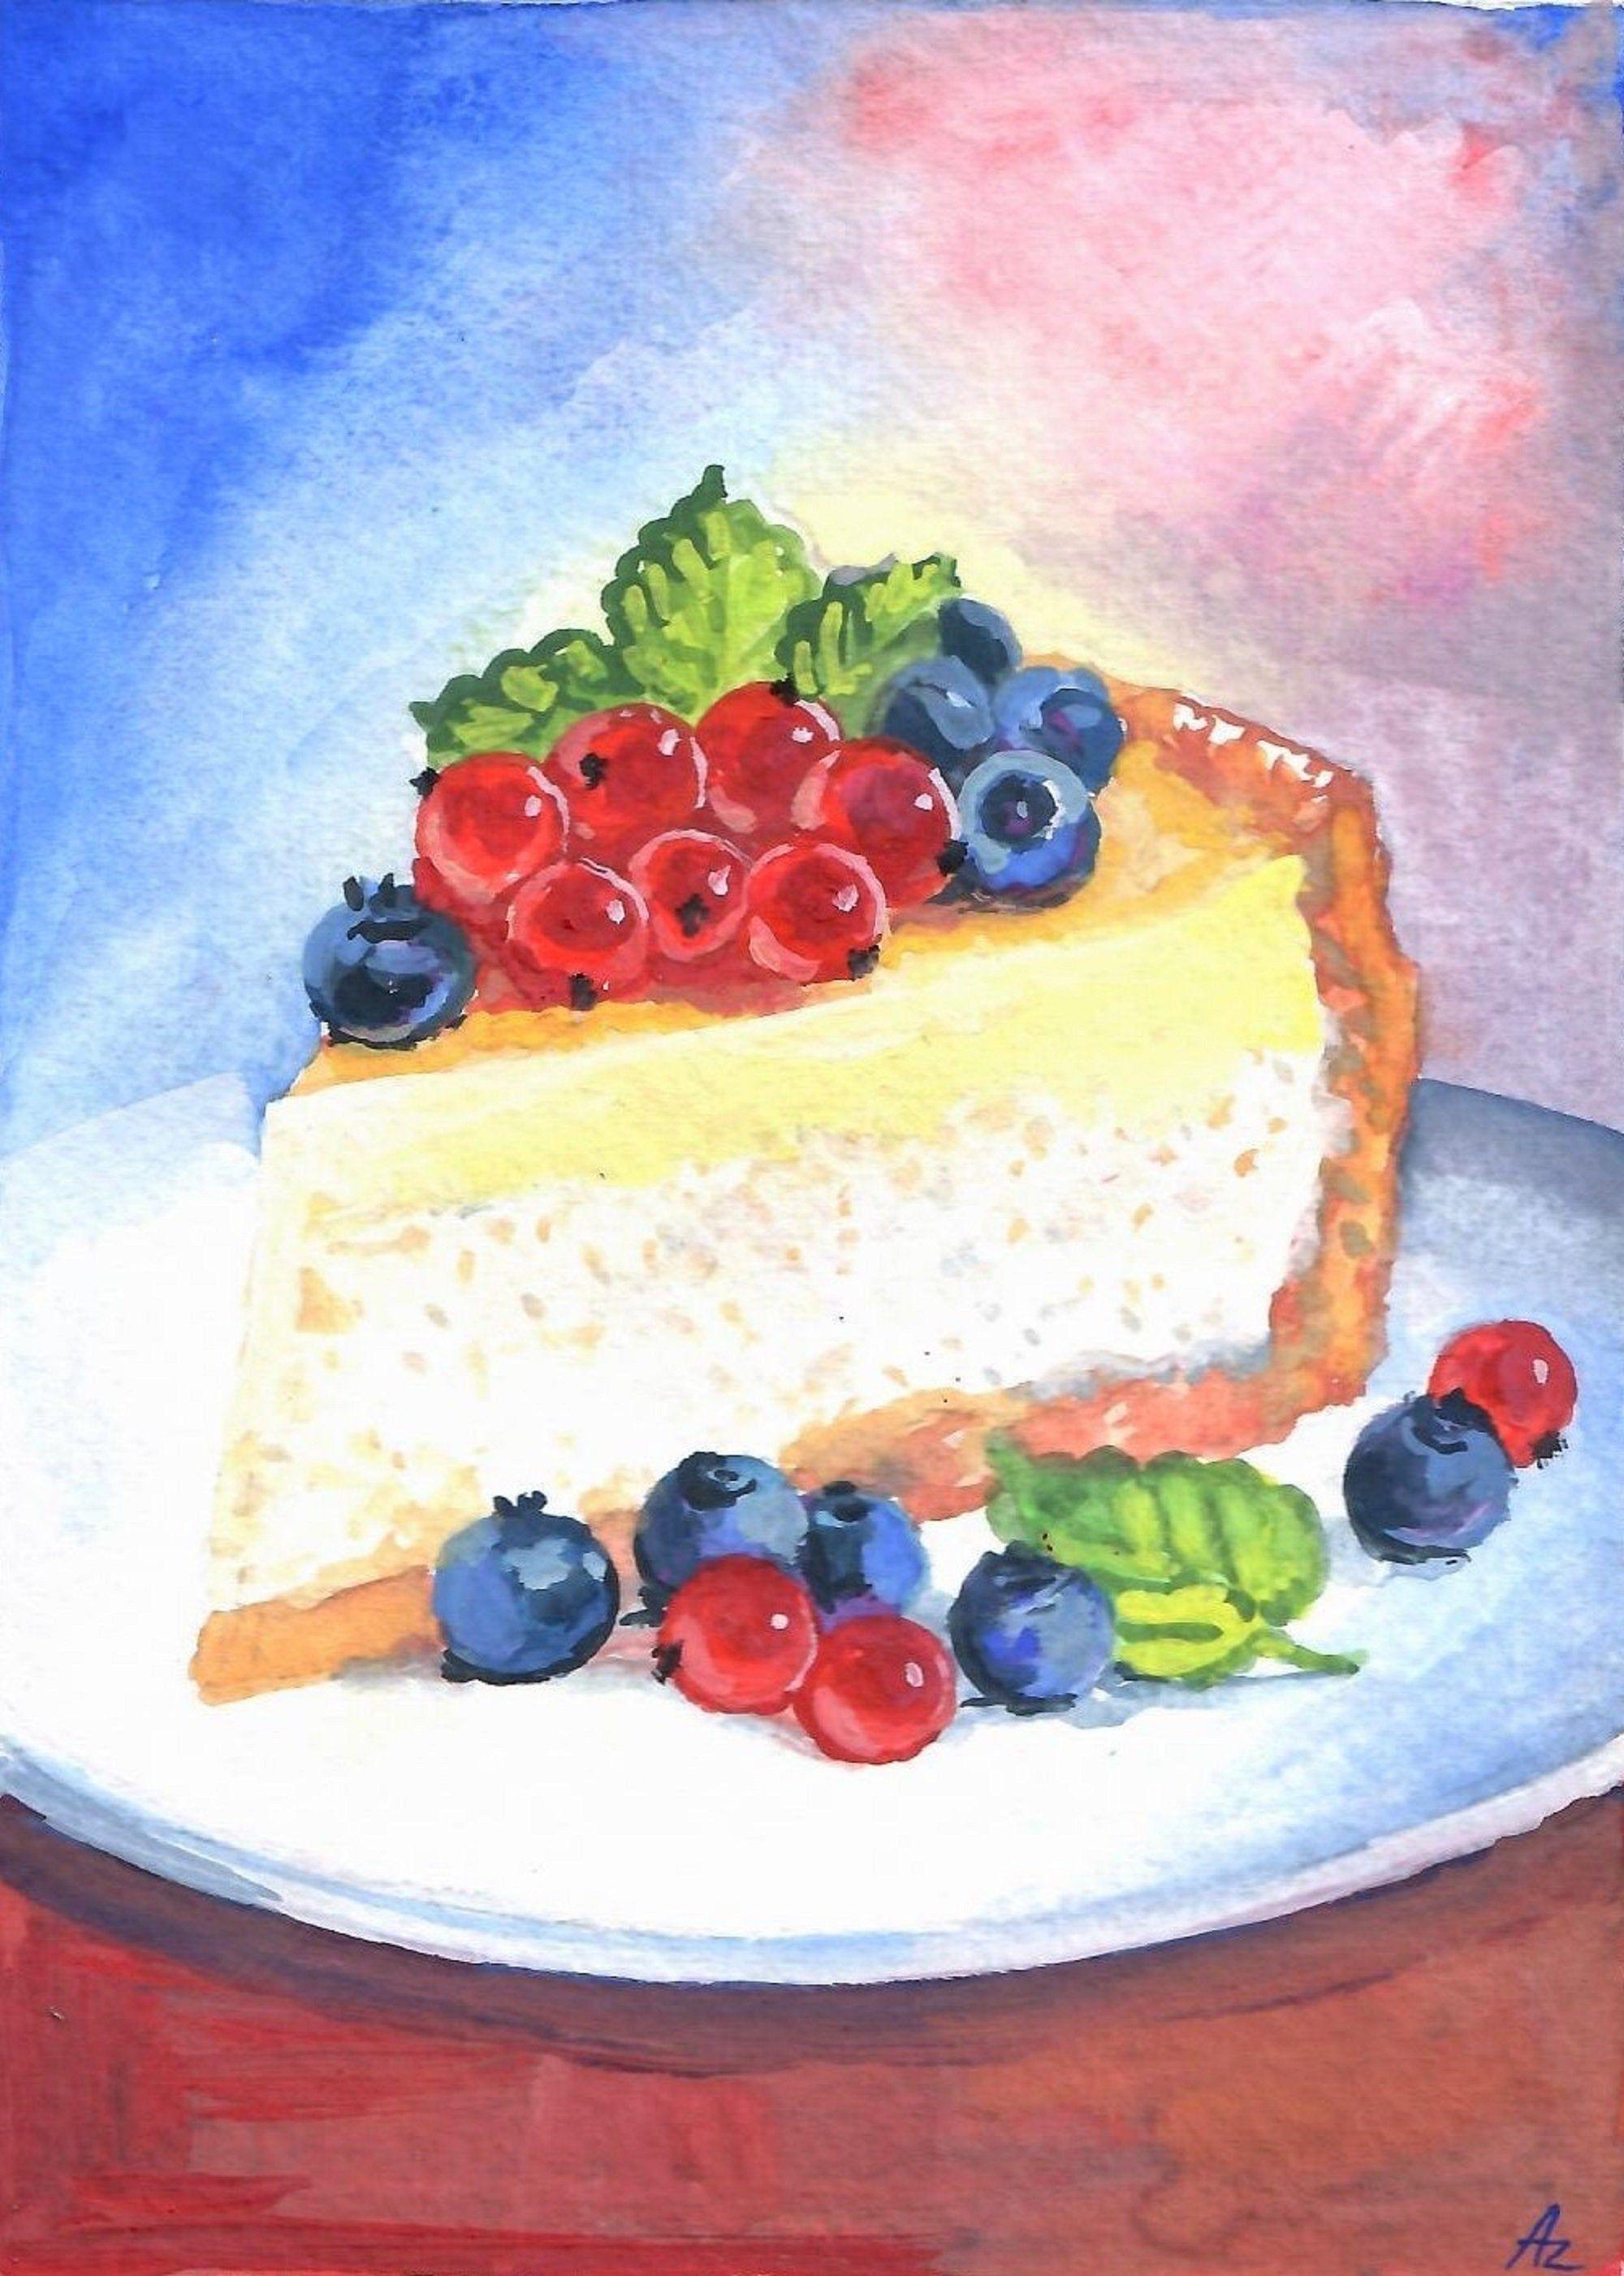 Original Print  antique print decorative art kitchen decor wall art Cake art dessert art Artistic Dishes